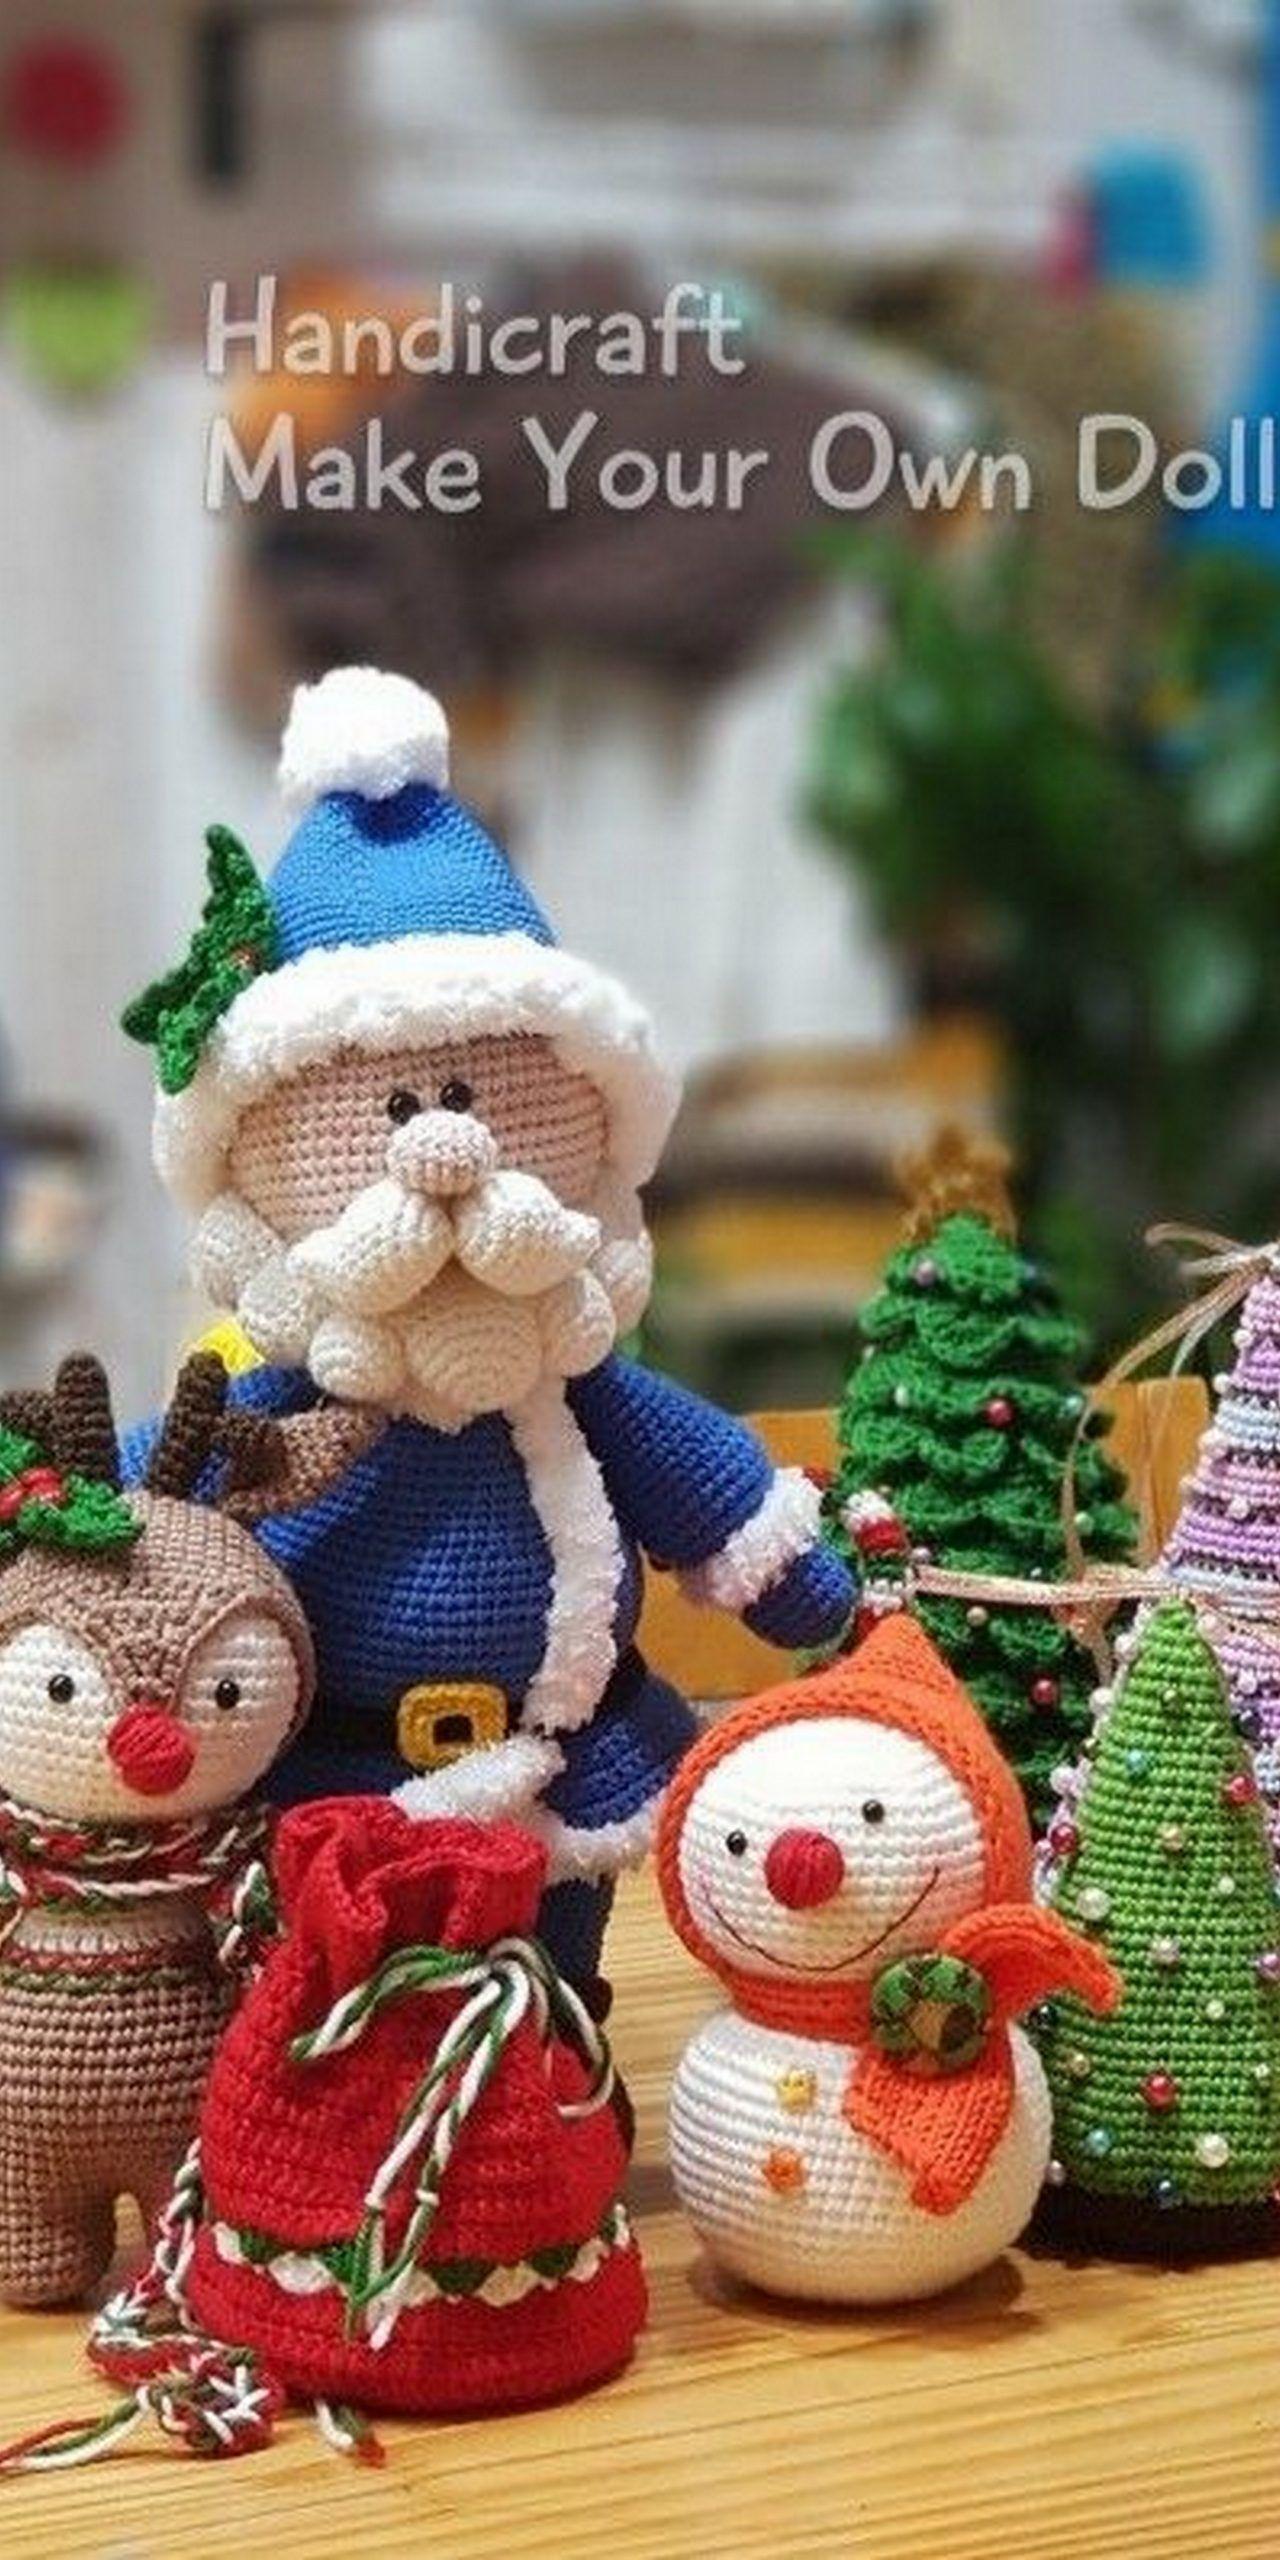 Christmas Crochet Patterns 2020 Amigurumi Christmas Doll Tutorial Free Pattern – Free Amigurumi